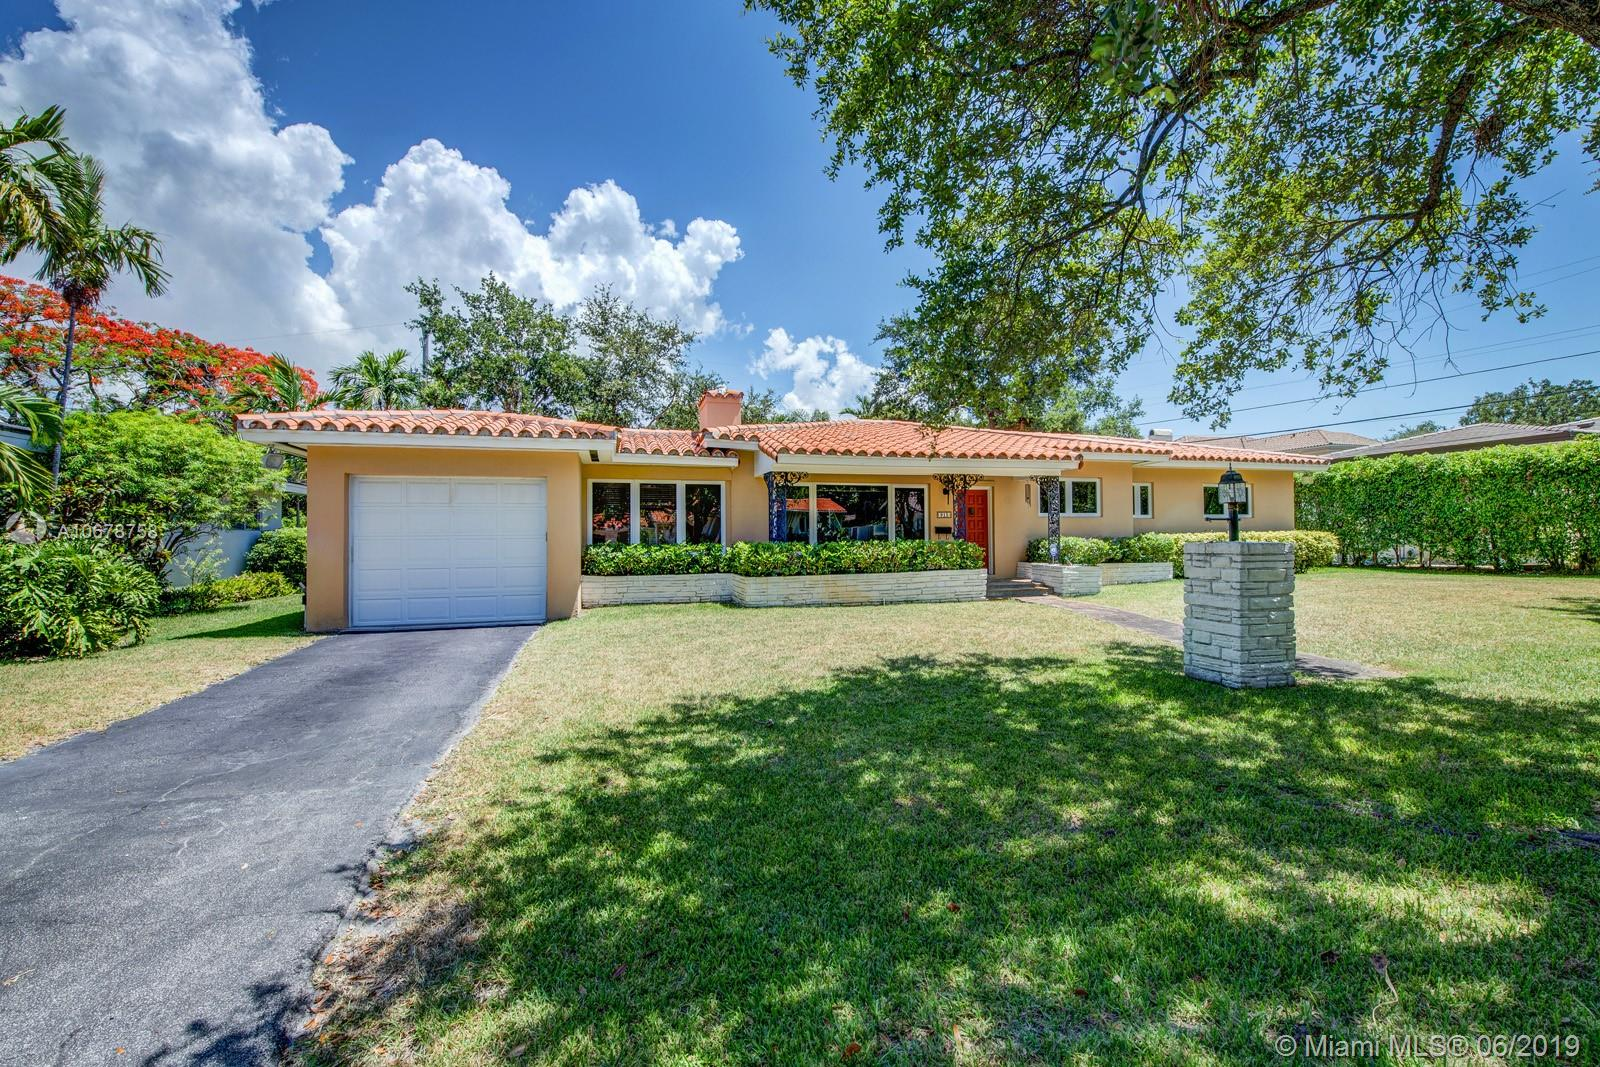 915 Osorio Ave, Coral Gables FL 33146